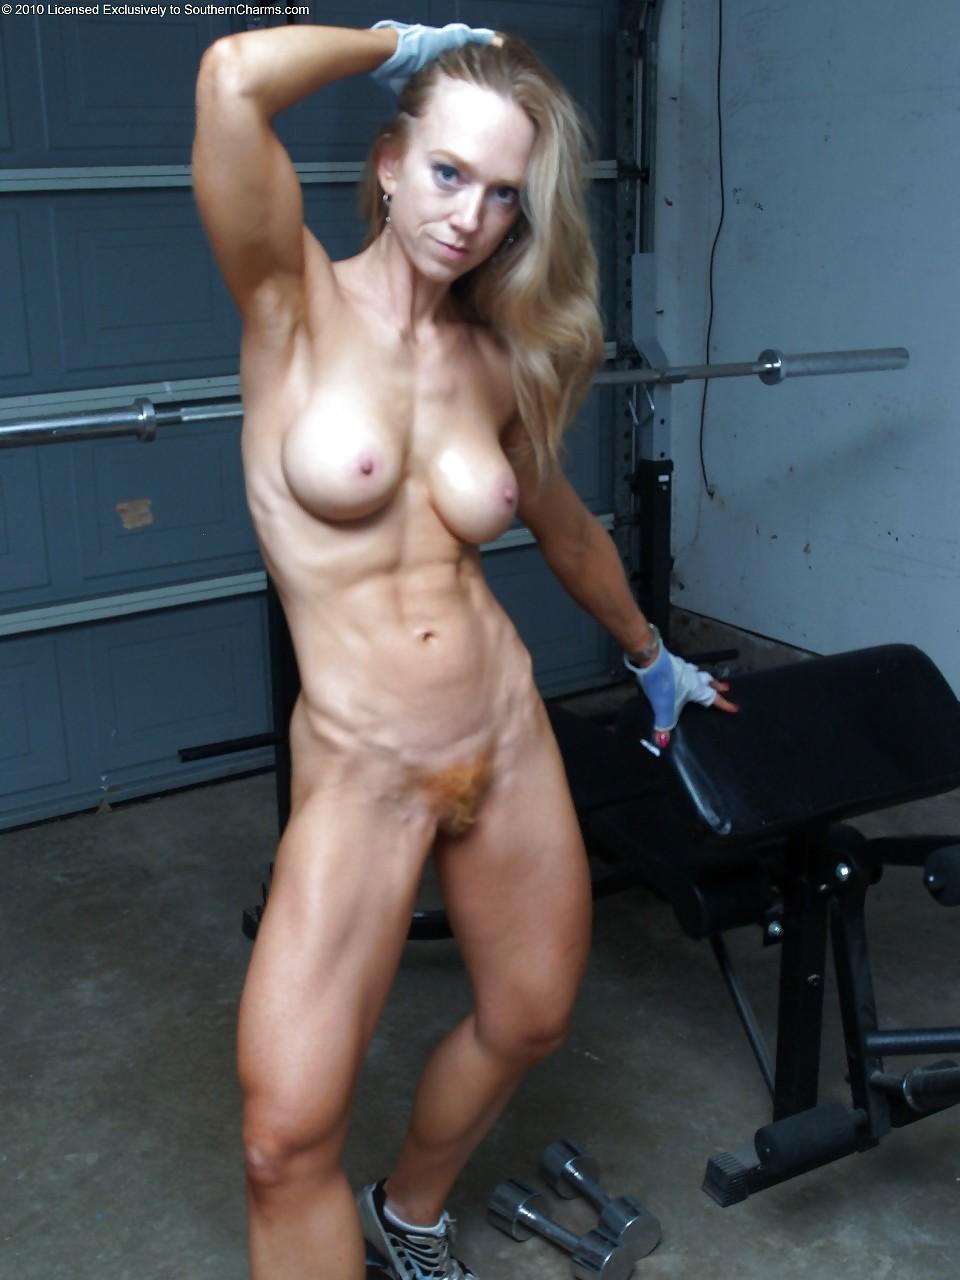 naked-fitness-amateur-women